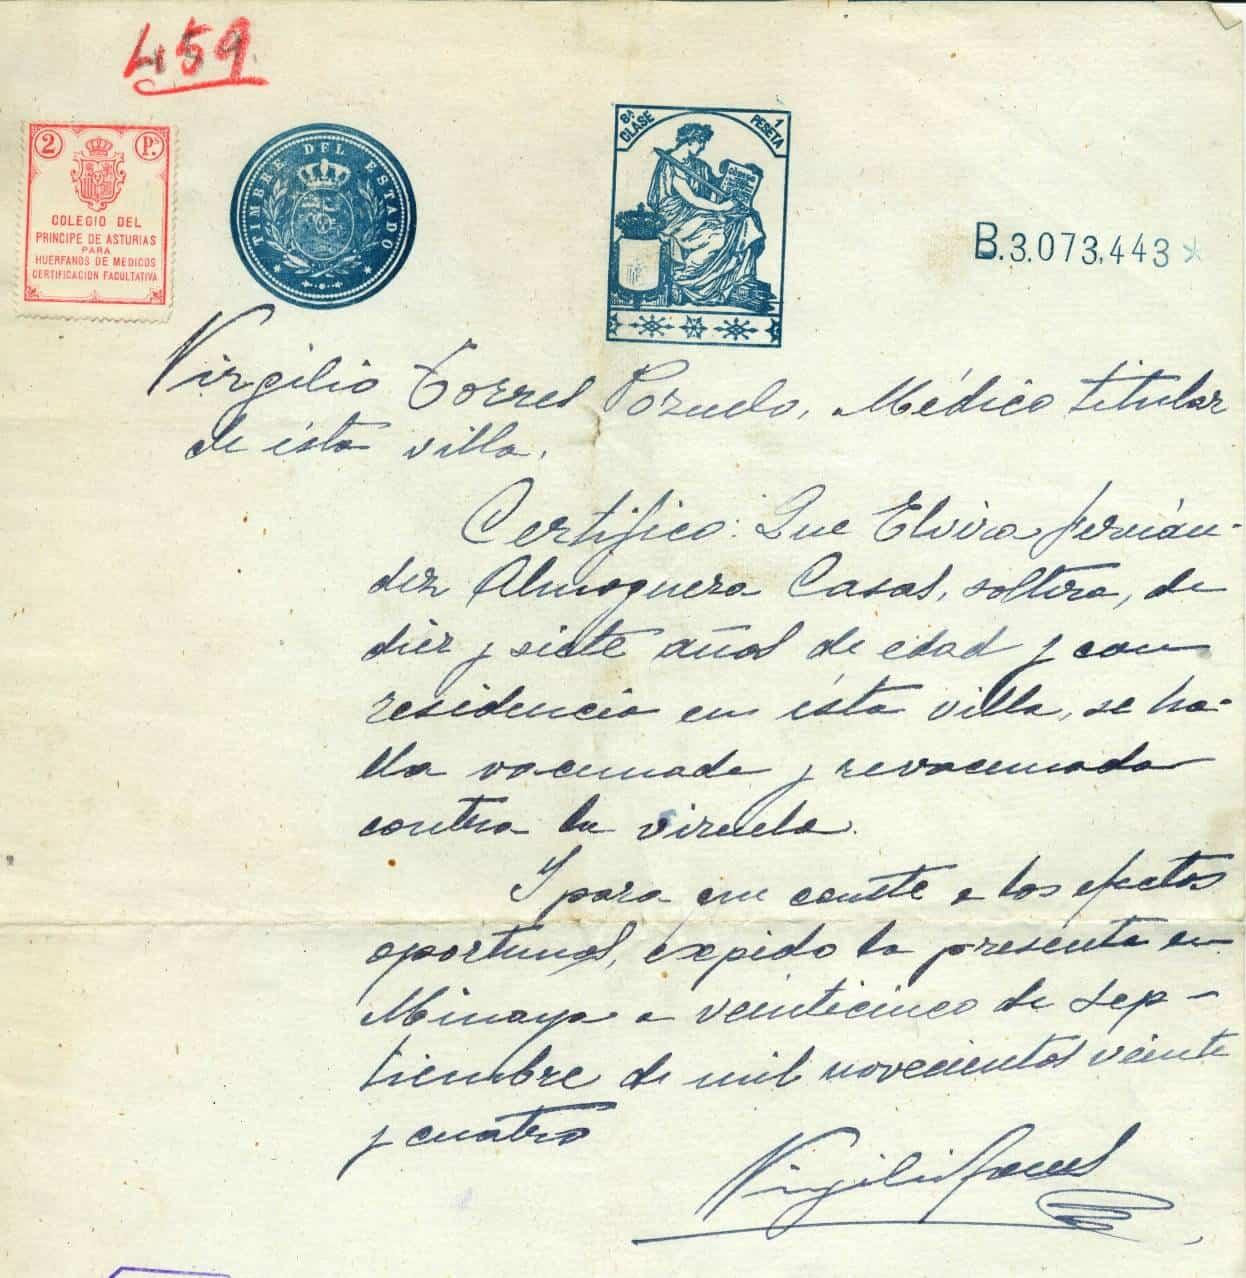 elvira 15 - Elvira Fernández-Almoguera Casas, primera fiscal en la historia de España